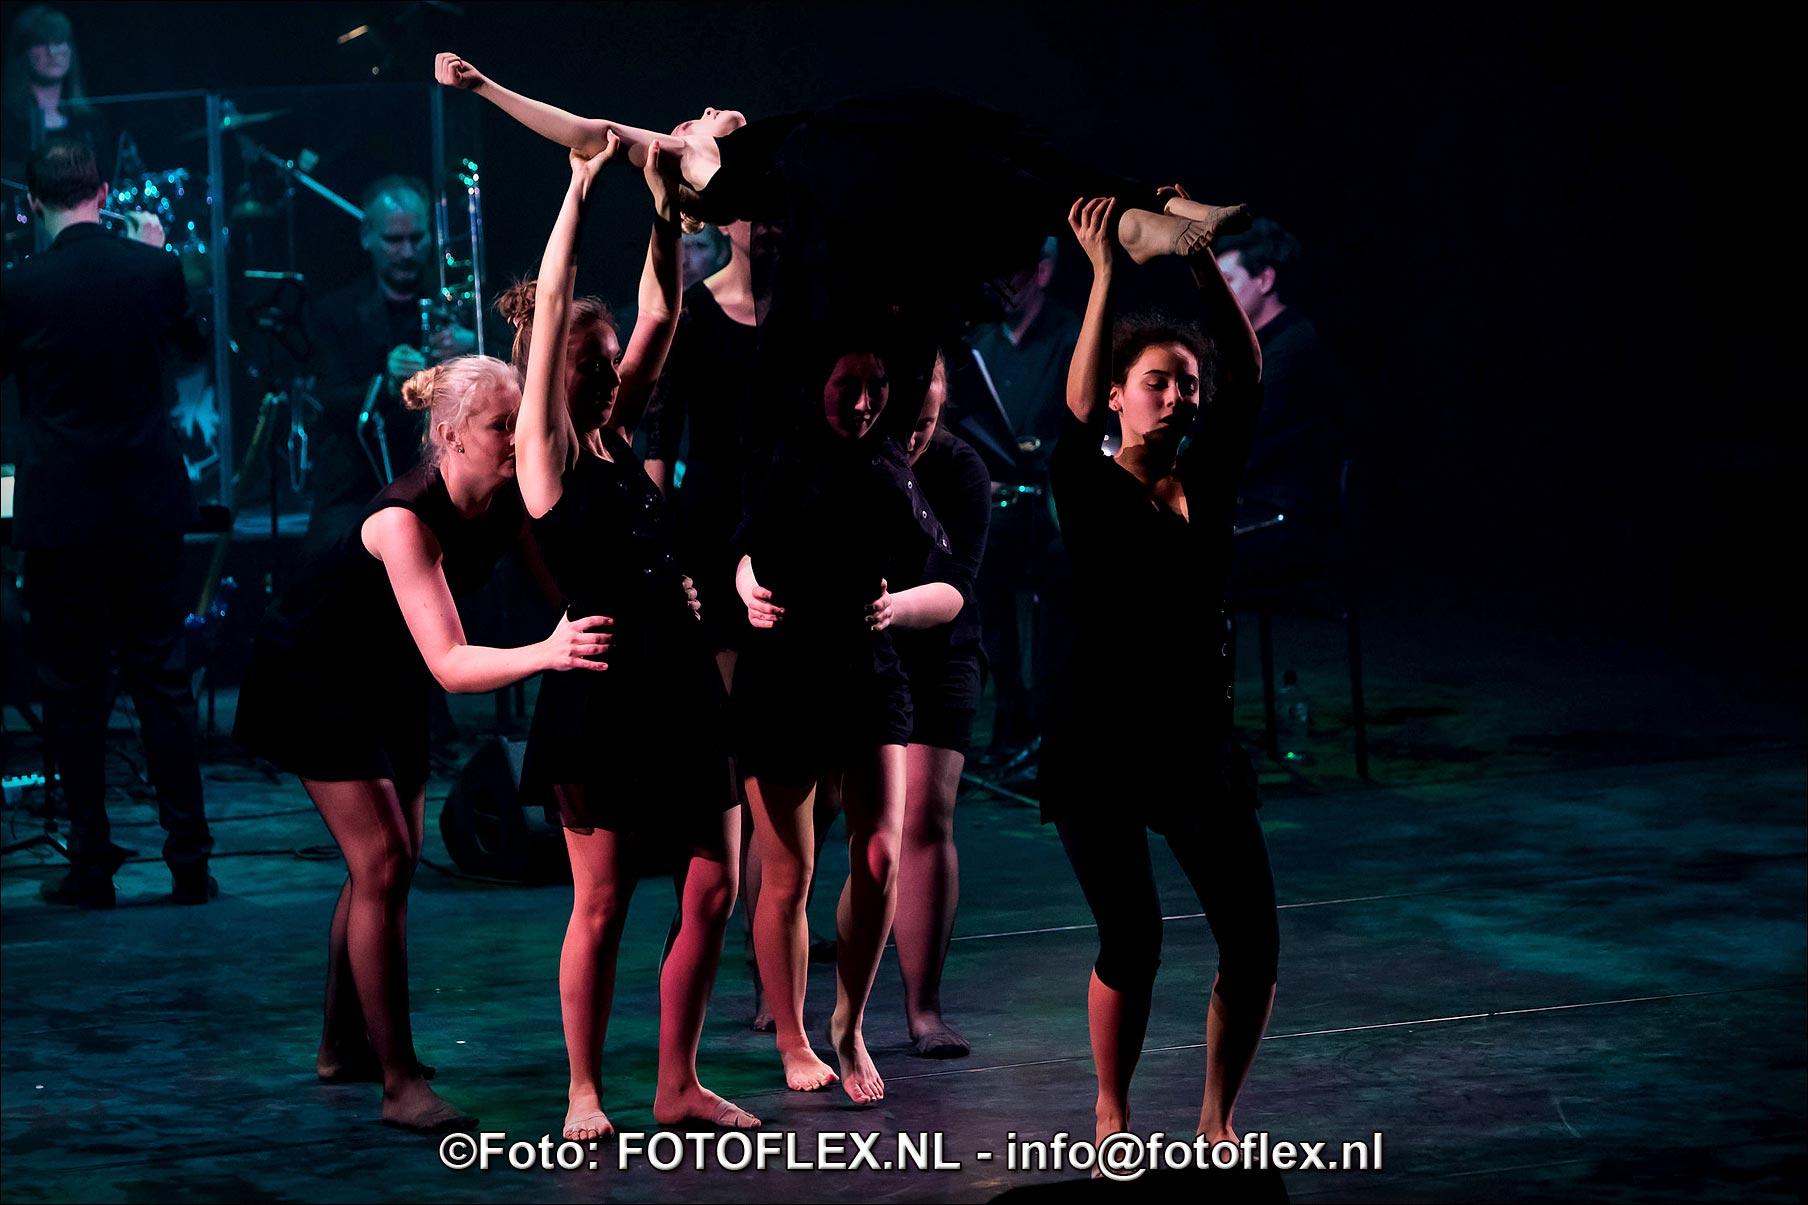 0562-CopyrightFOTOFLEX.NL07012020